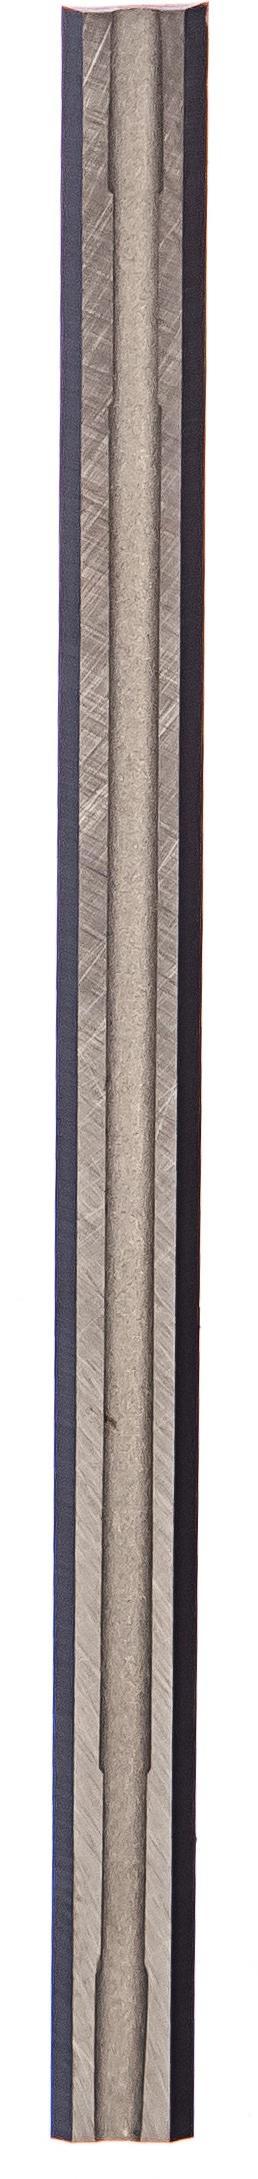 Ножи для рубанка Bosch Woodrazor 82 мм, 2 шт. (2.608.635.350) кеннел с на острие ножа роман